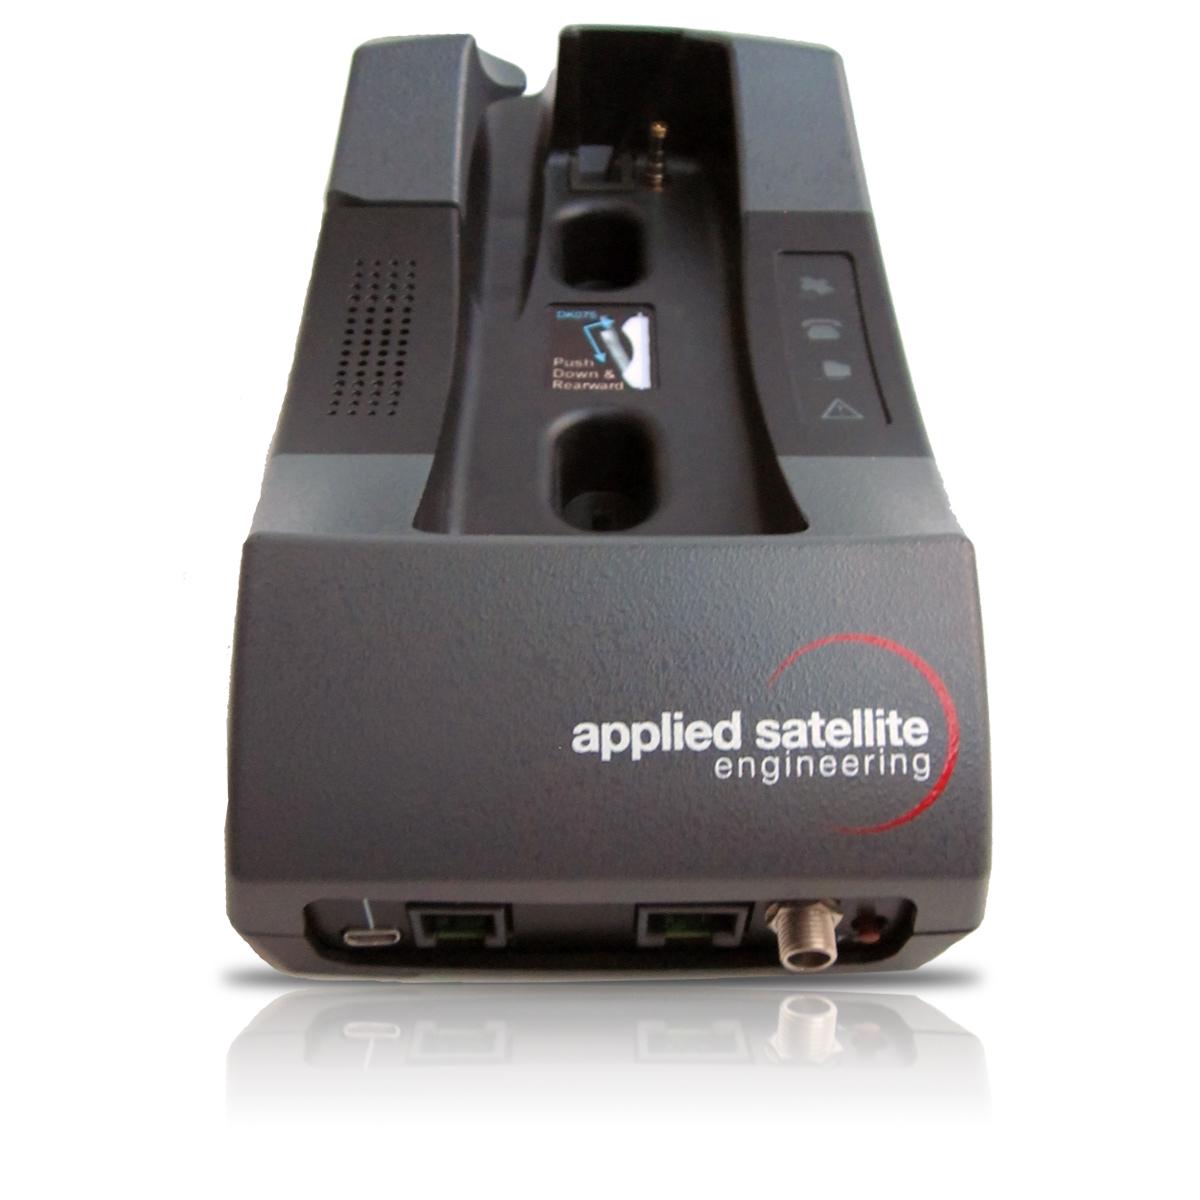 ase-dk075-docking-station-for-iridium-9555-satellite-phone.jpg